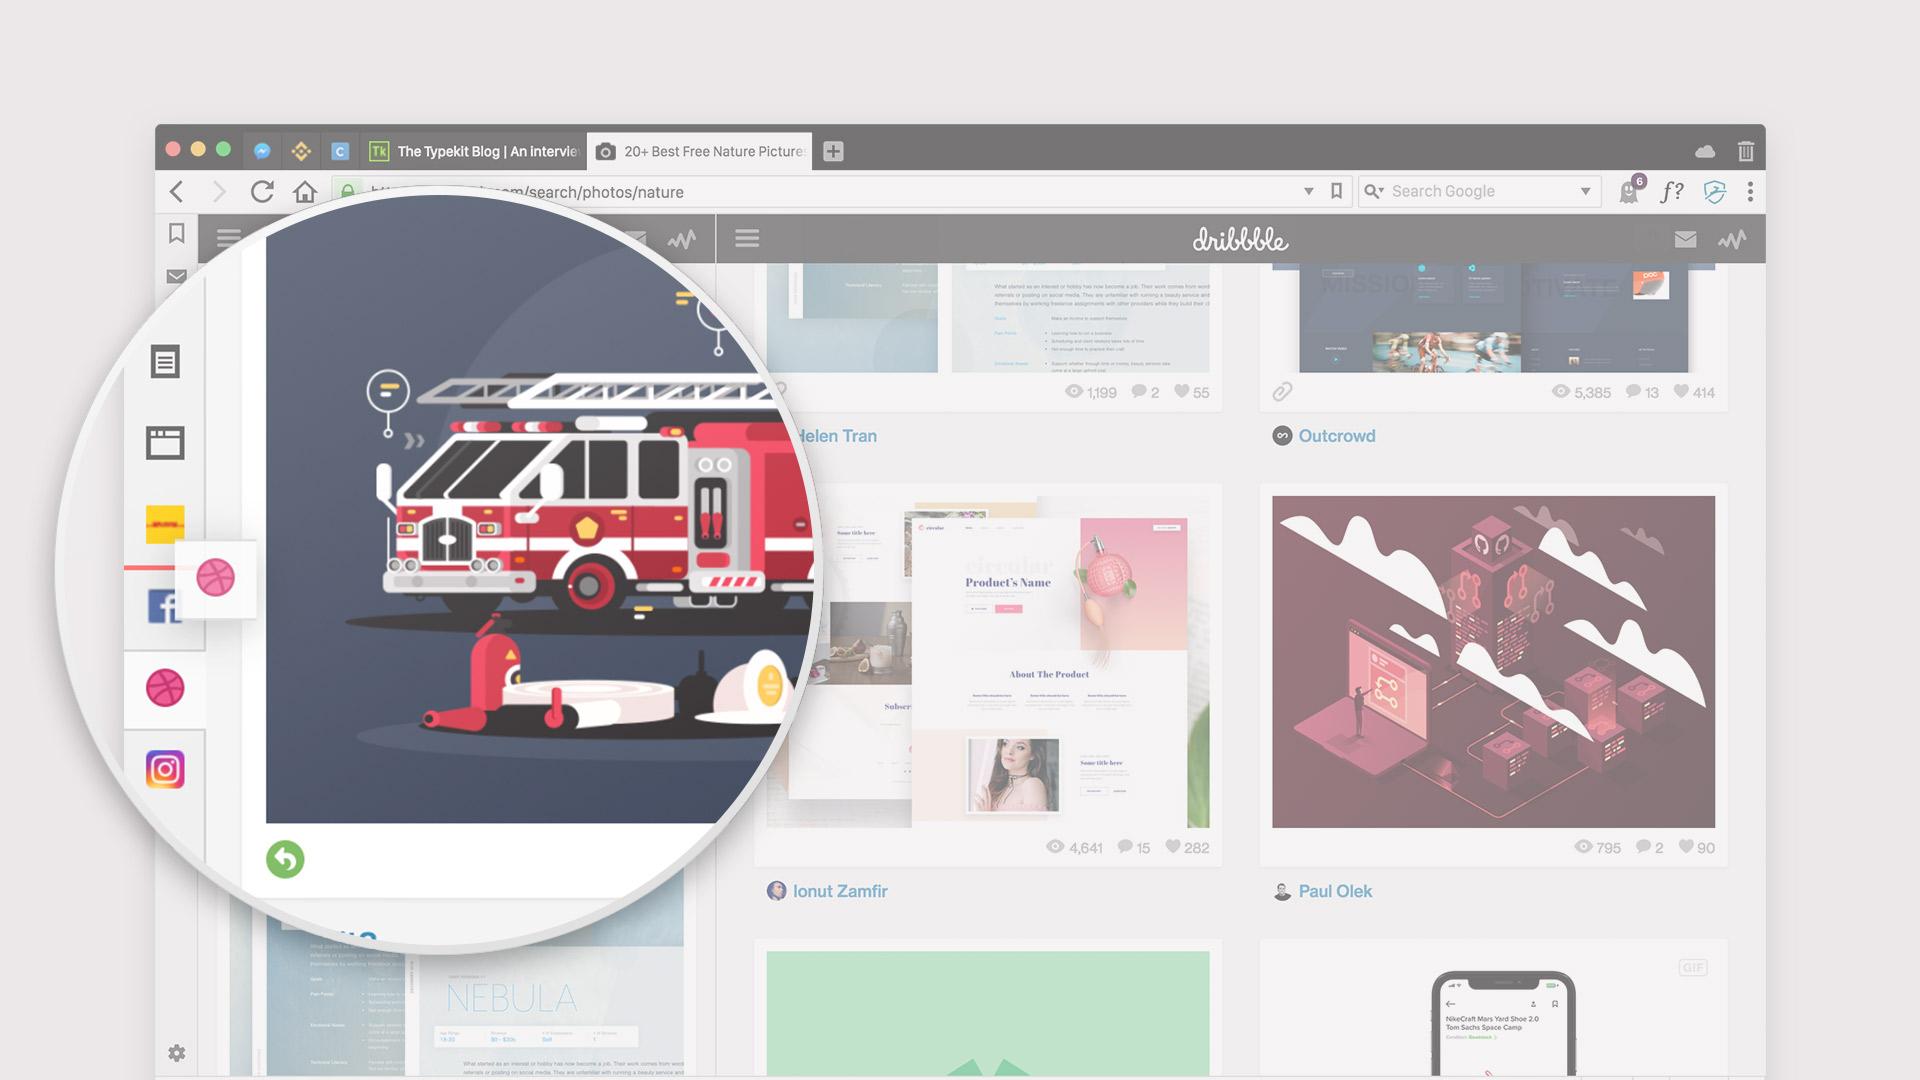 Movable Web Panels | Snapshot | Vivaldi Browser